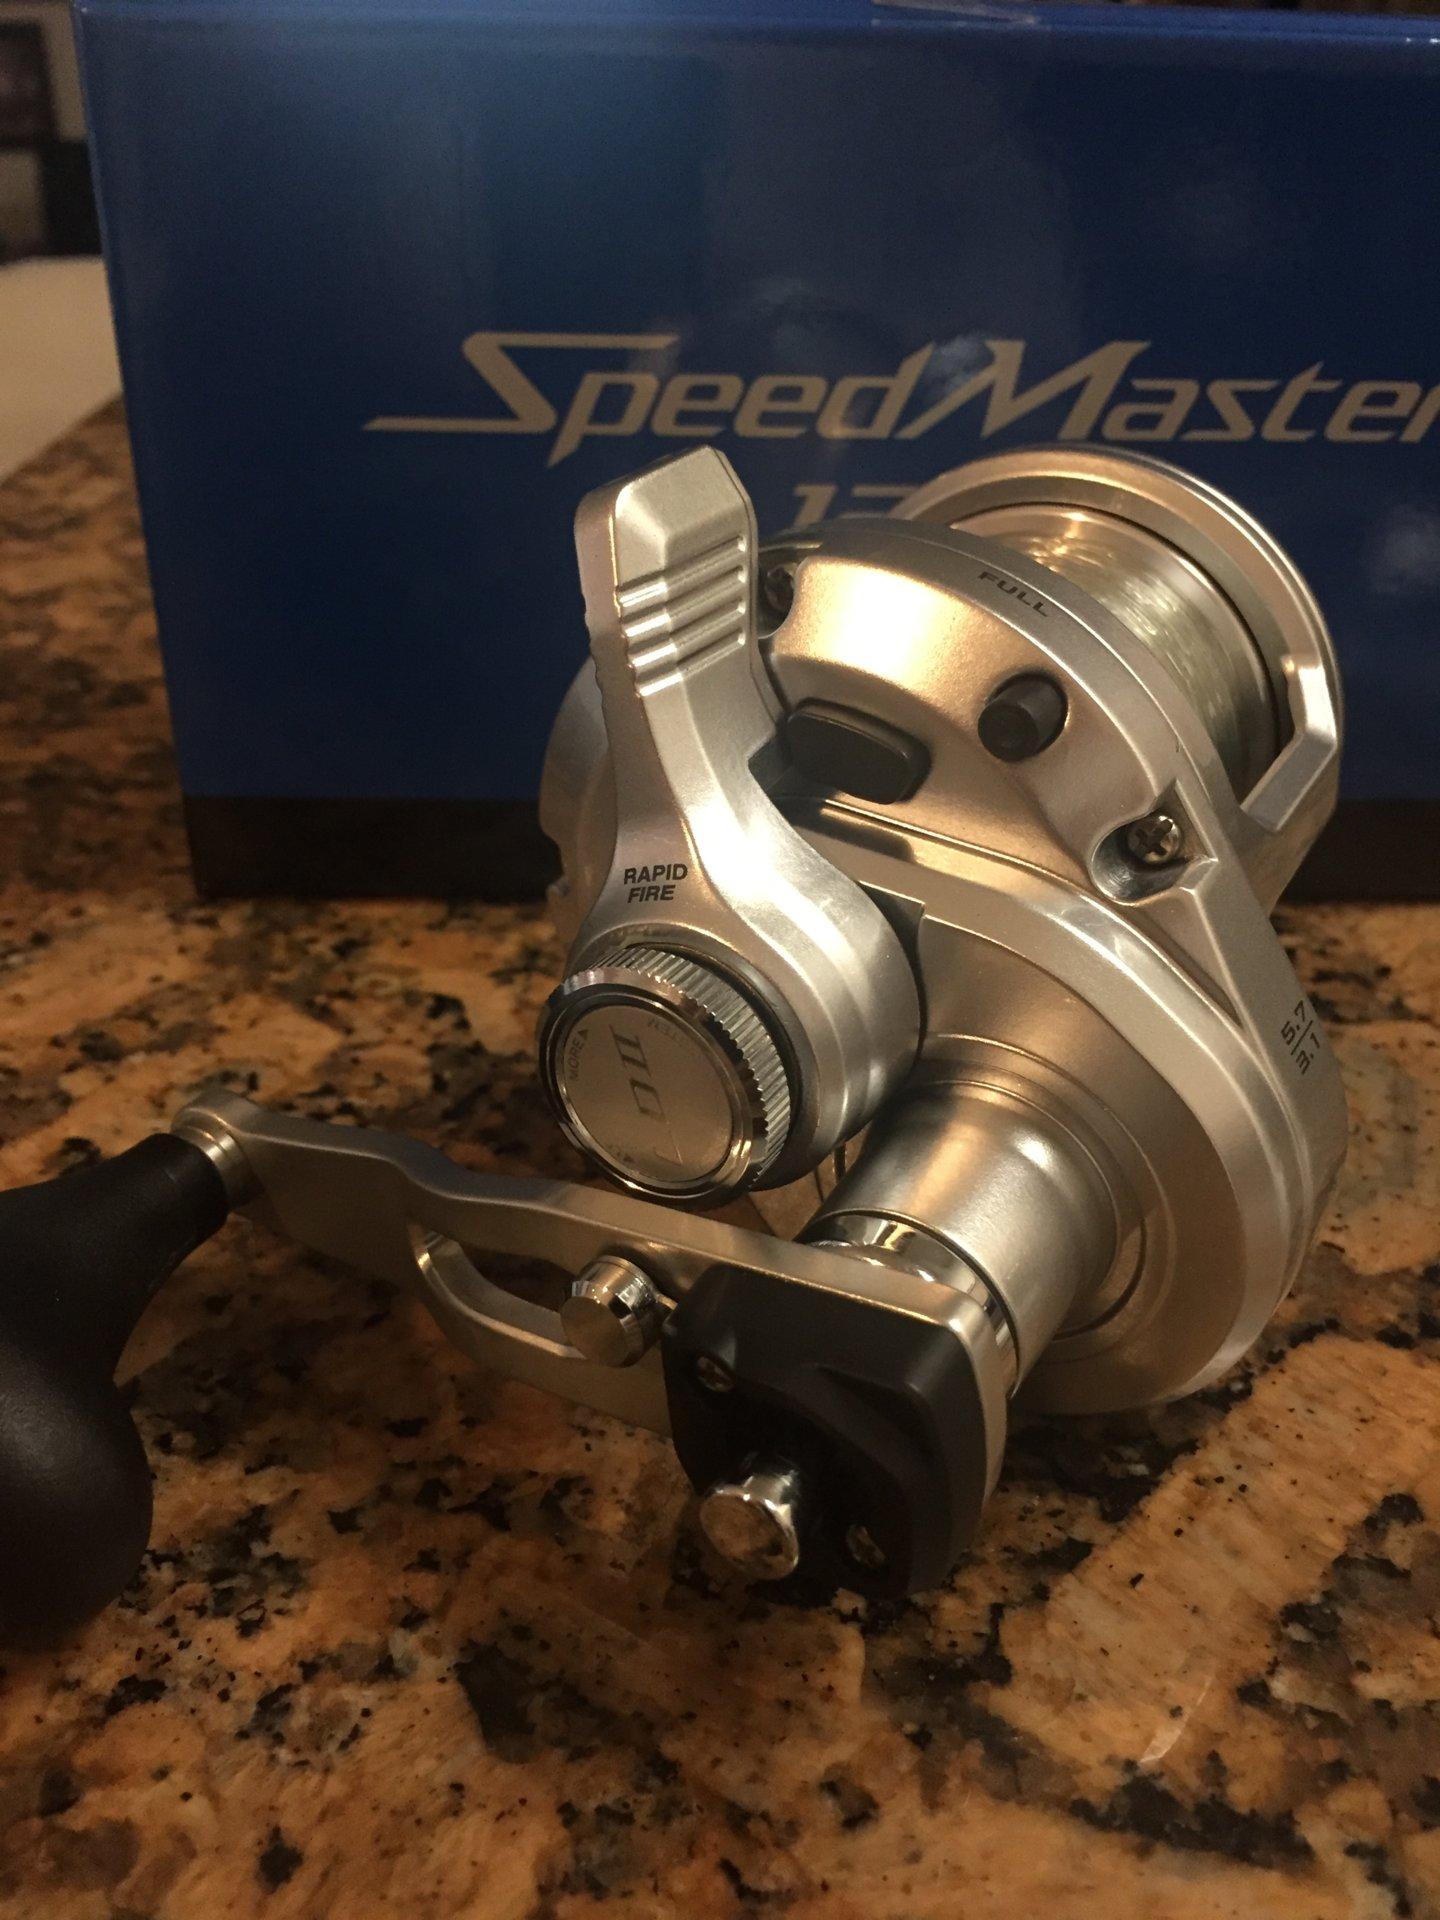 New Shimano Speedmaster II LD 2-Speed | Bloodydecks